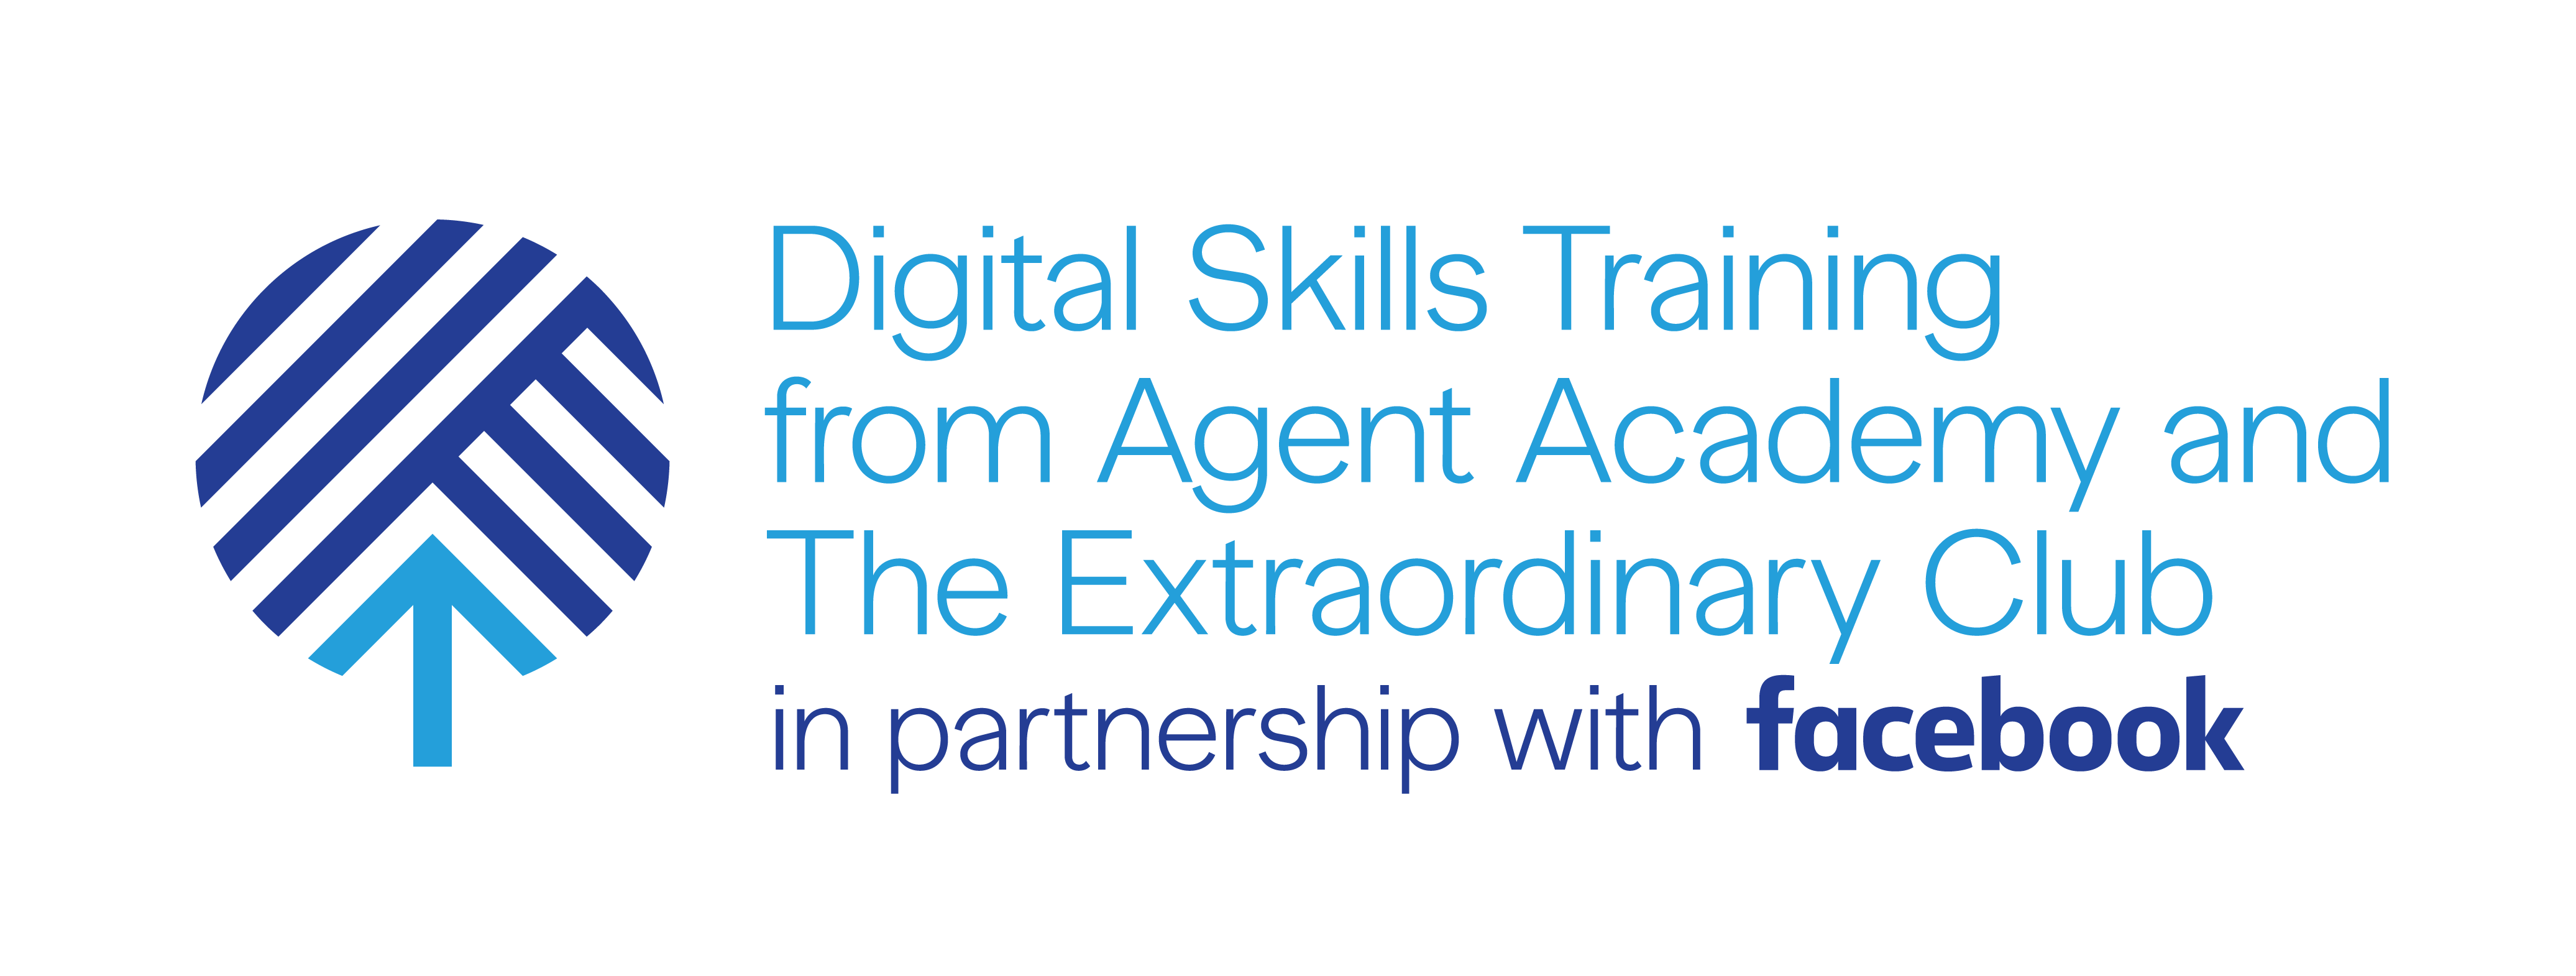 Digitla Skills Training logo